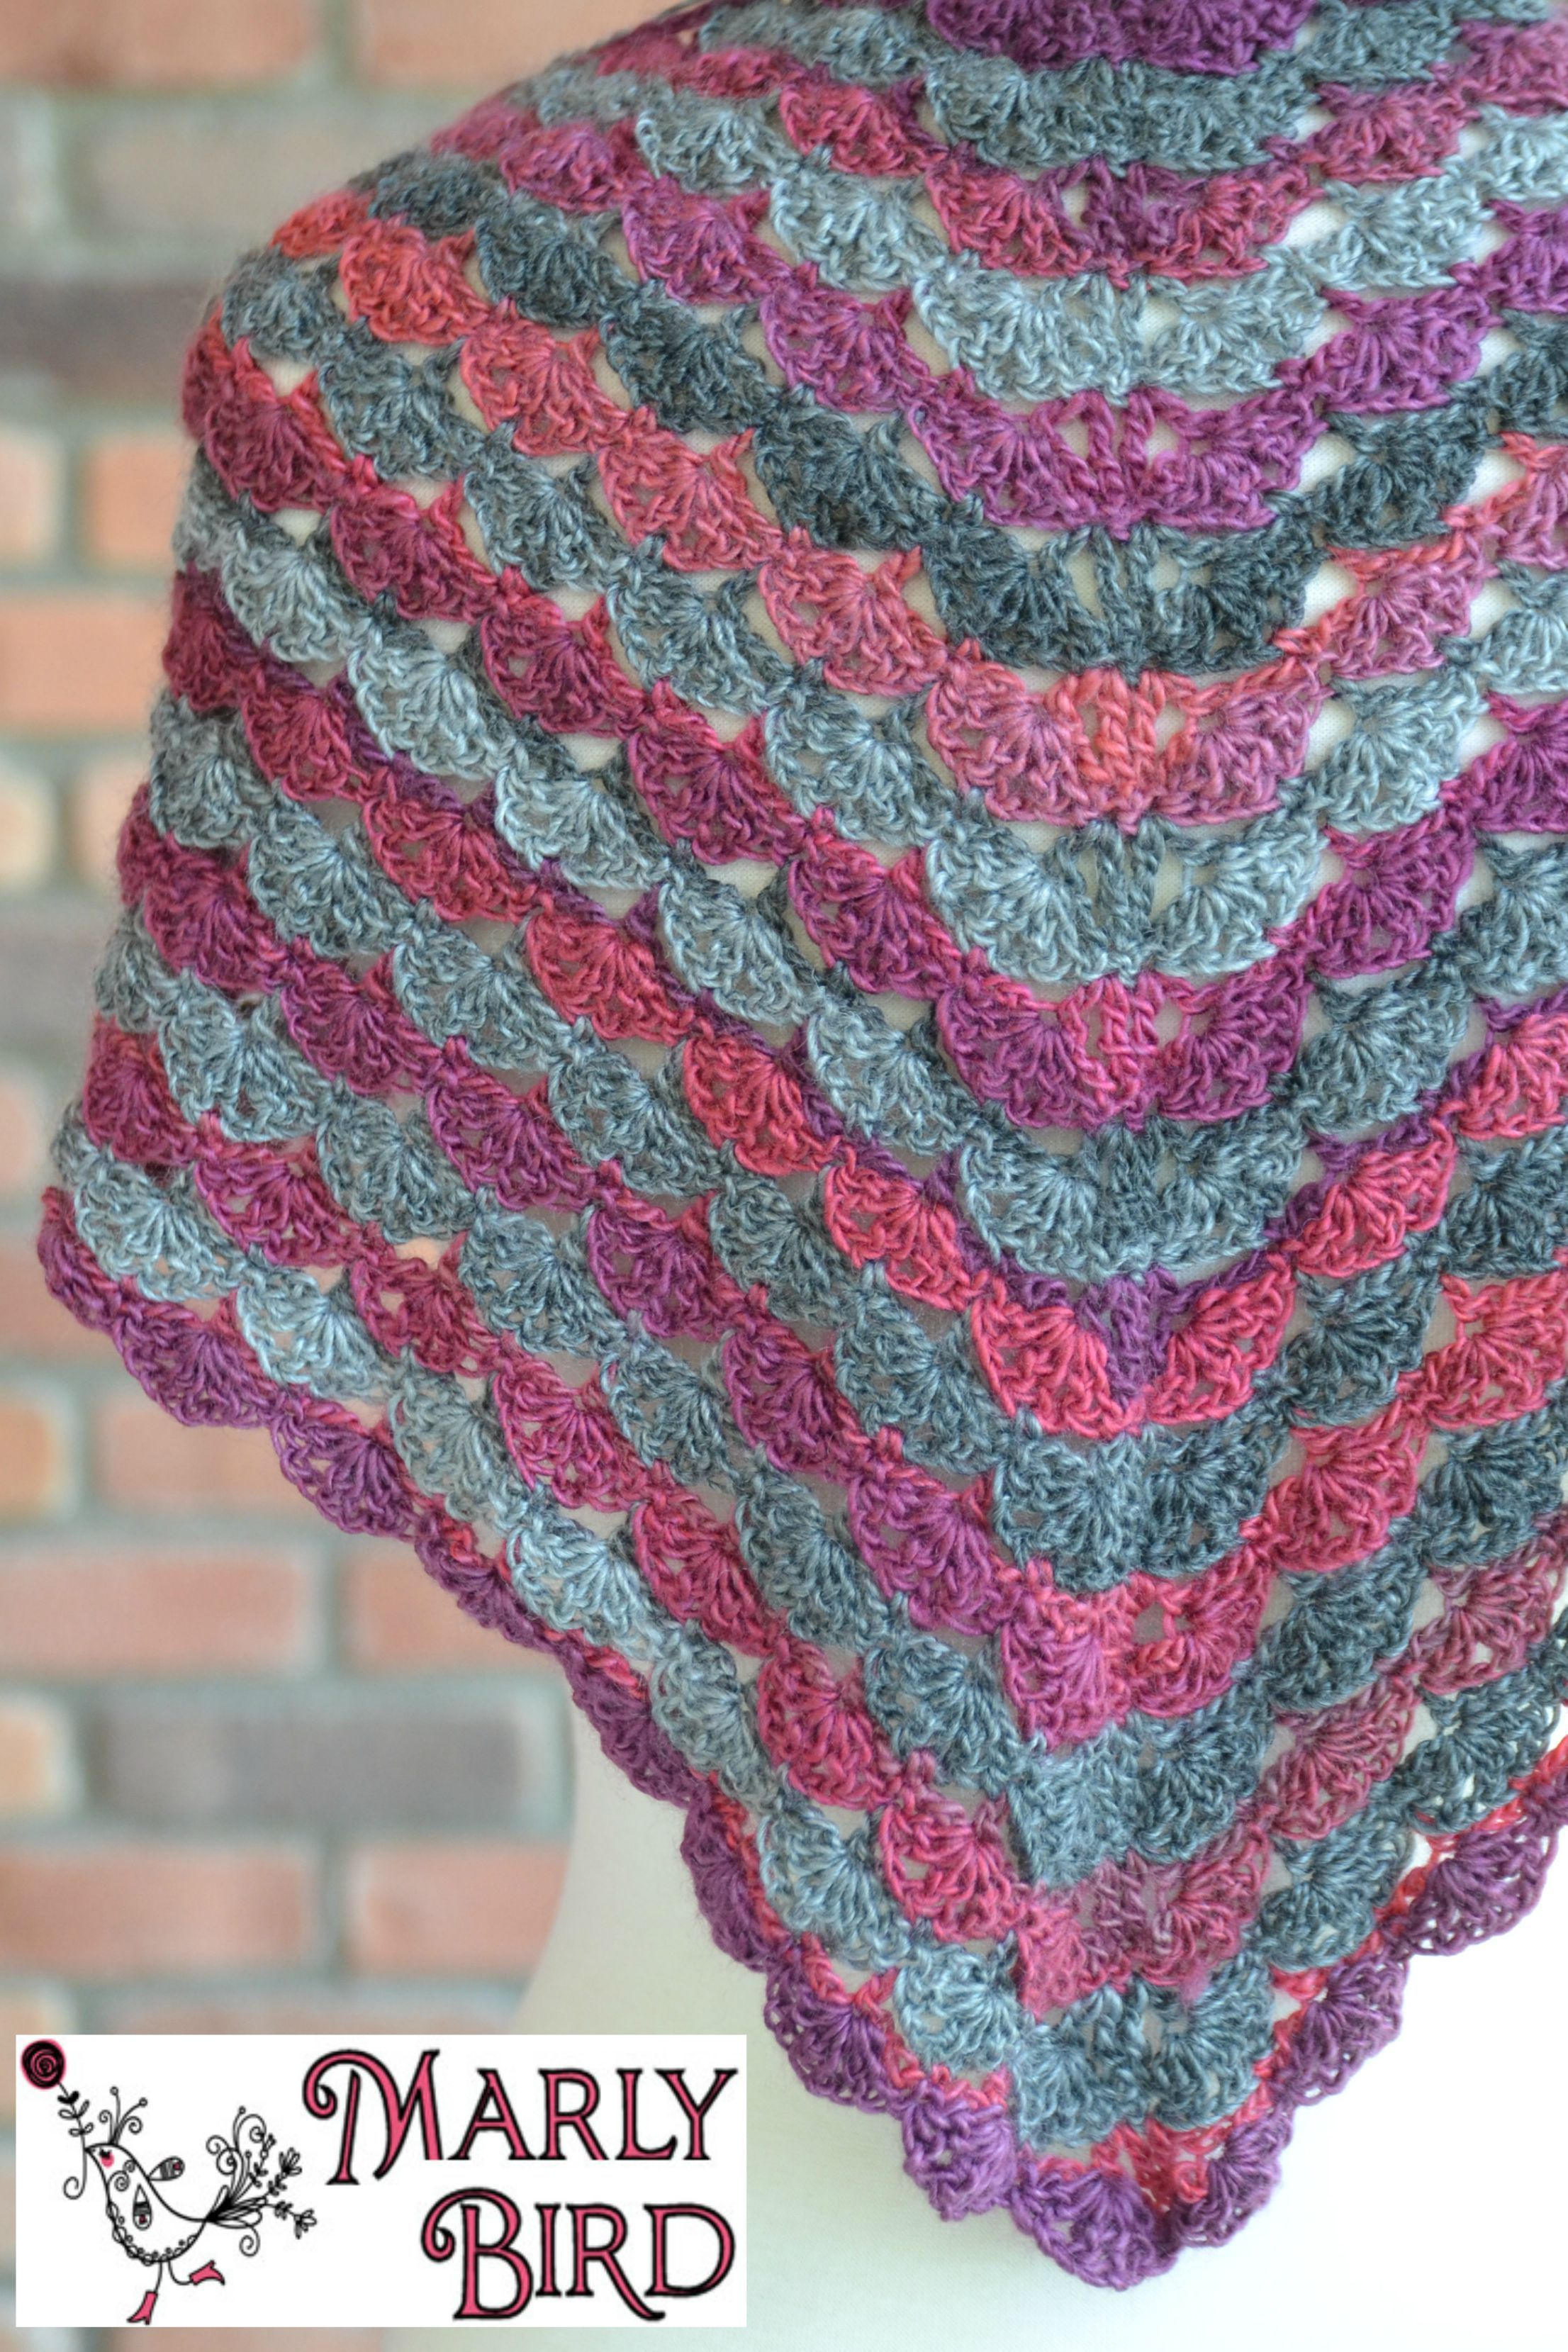 Free Crochet Shawl: No Stopping Me Now | Free crochet shawl patterns ...